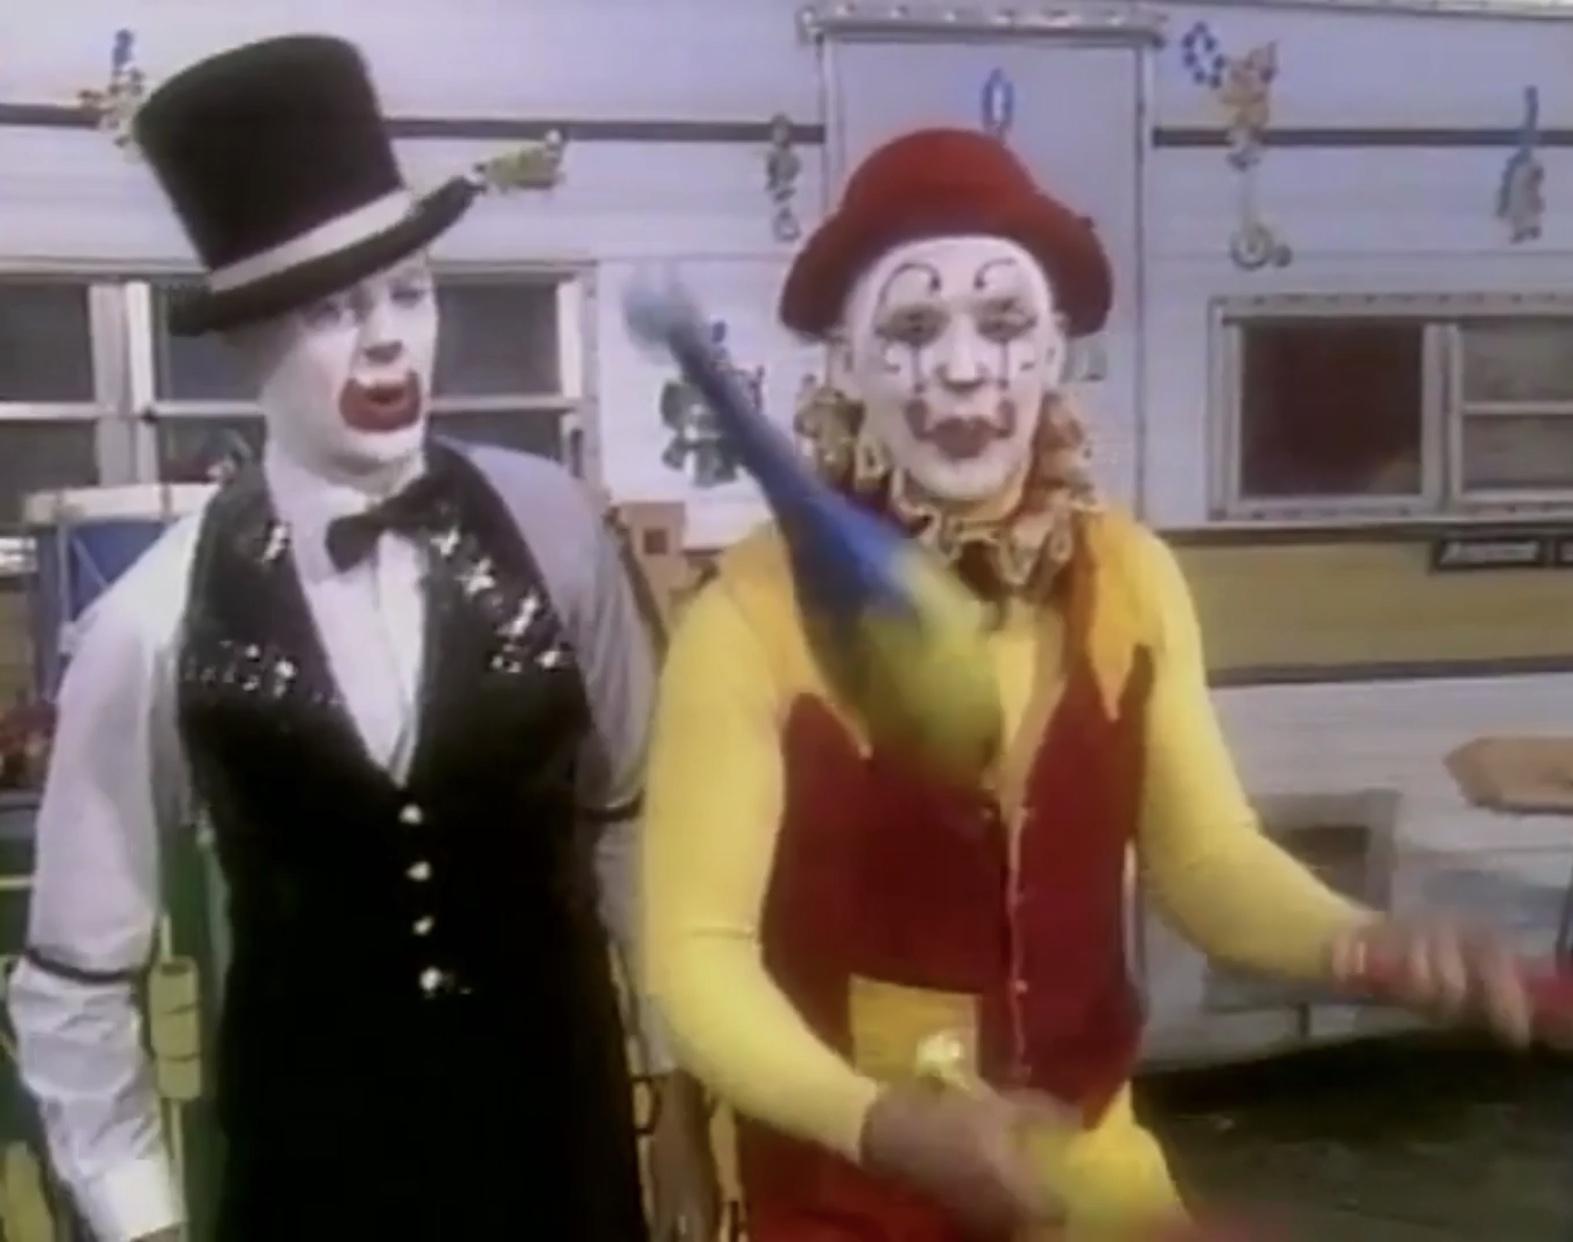 Bruce and Scott the Jugglers